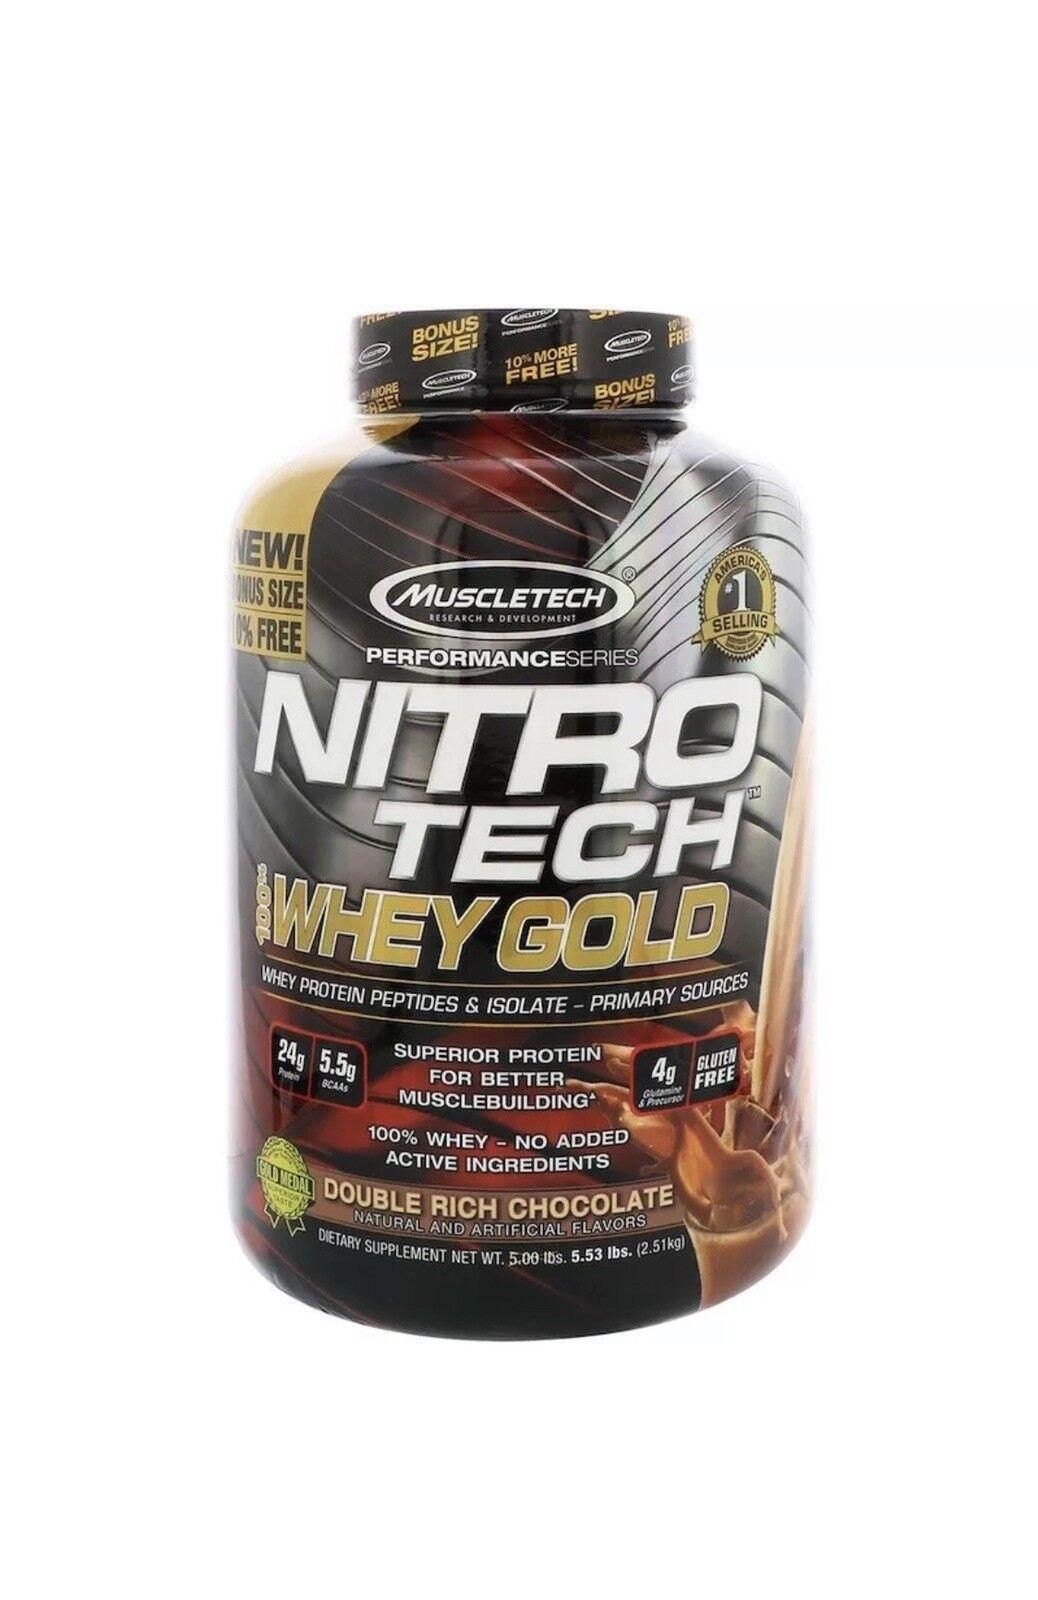 Muscletech Nitro Tech 100% Whey GoldDouble kg) Rich Chocolate (2.51 kg) GoldDouble Gluten Free 280d9c